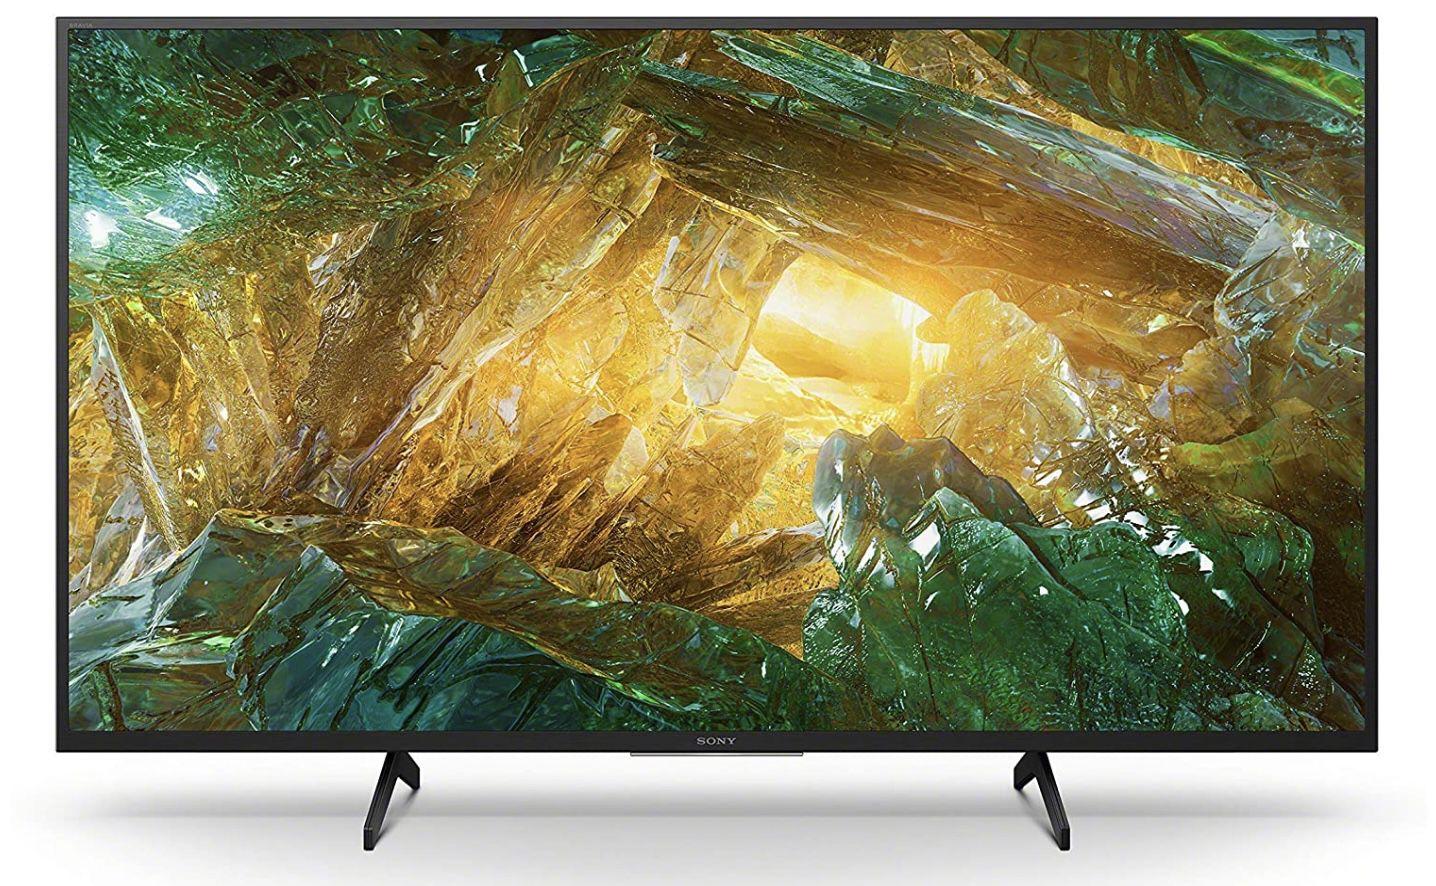 Sony KD 49XH8096 Bravia 49 Zoll UHD SmartTV mit HDR für 529€ (statt 583€)